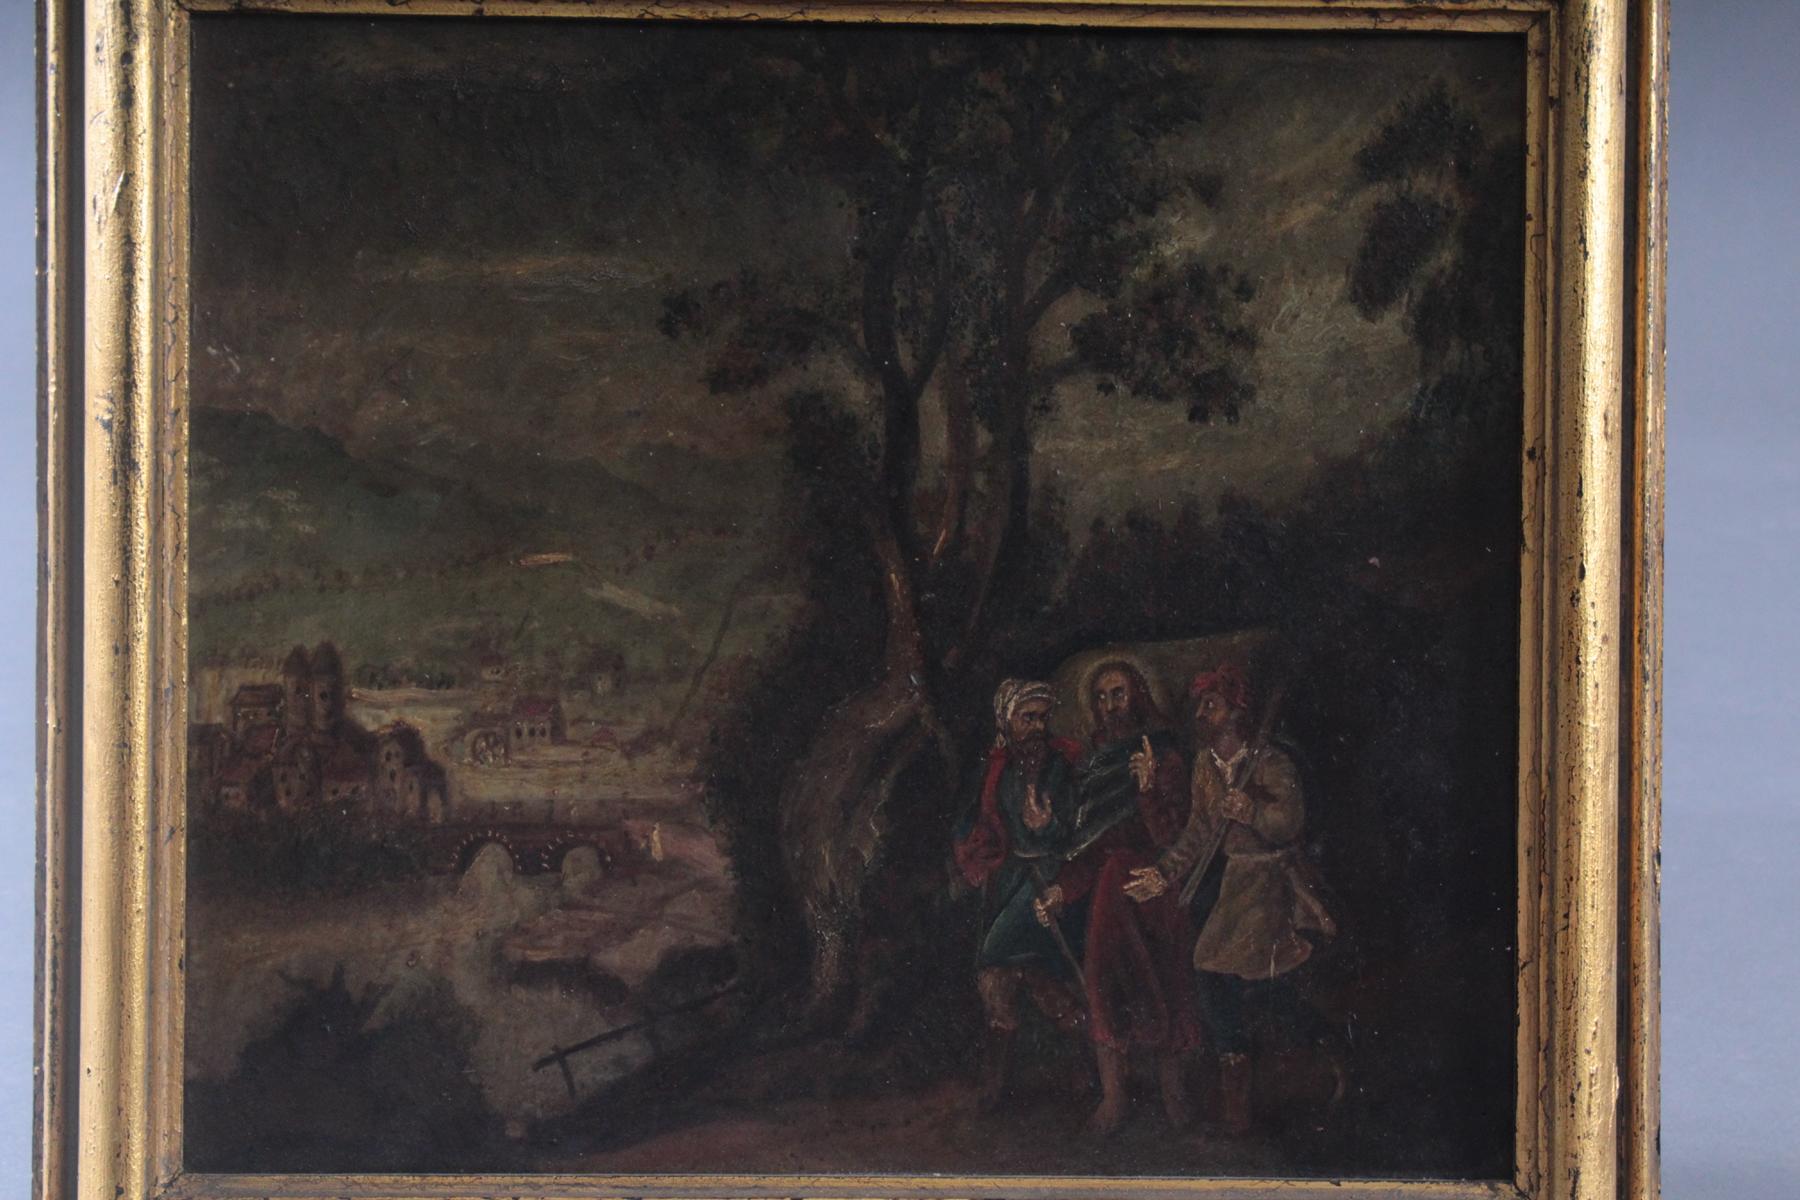 Religiöses Gemälde, 19. Jahrhundert. Unbekannter Künstler-2